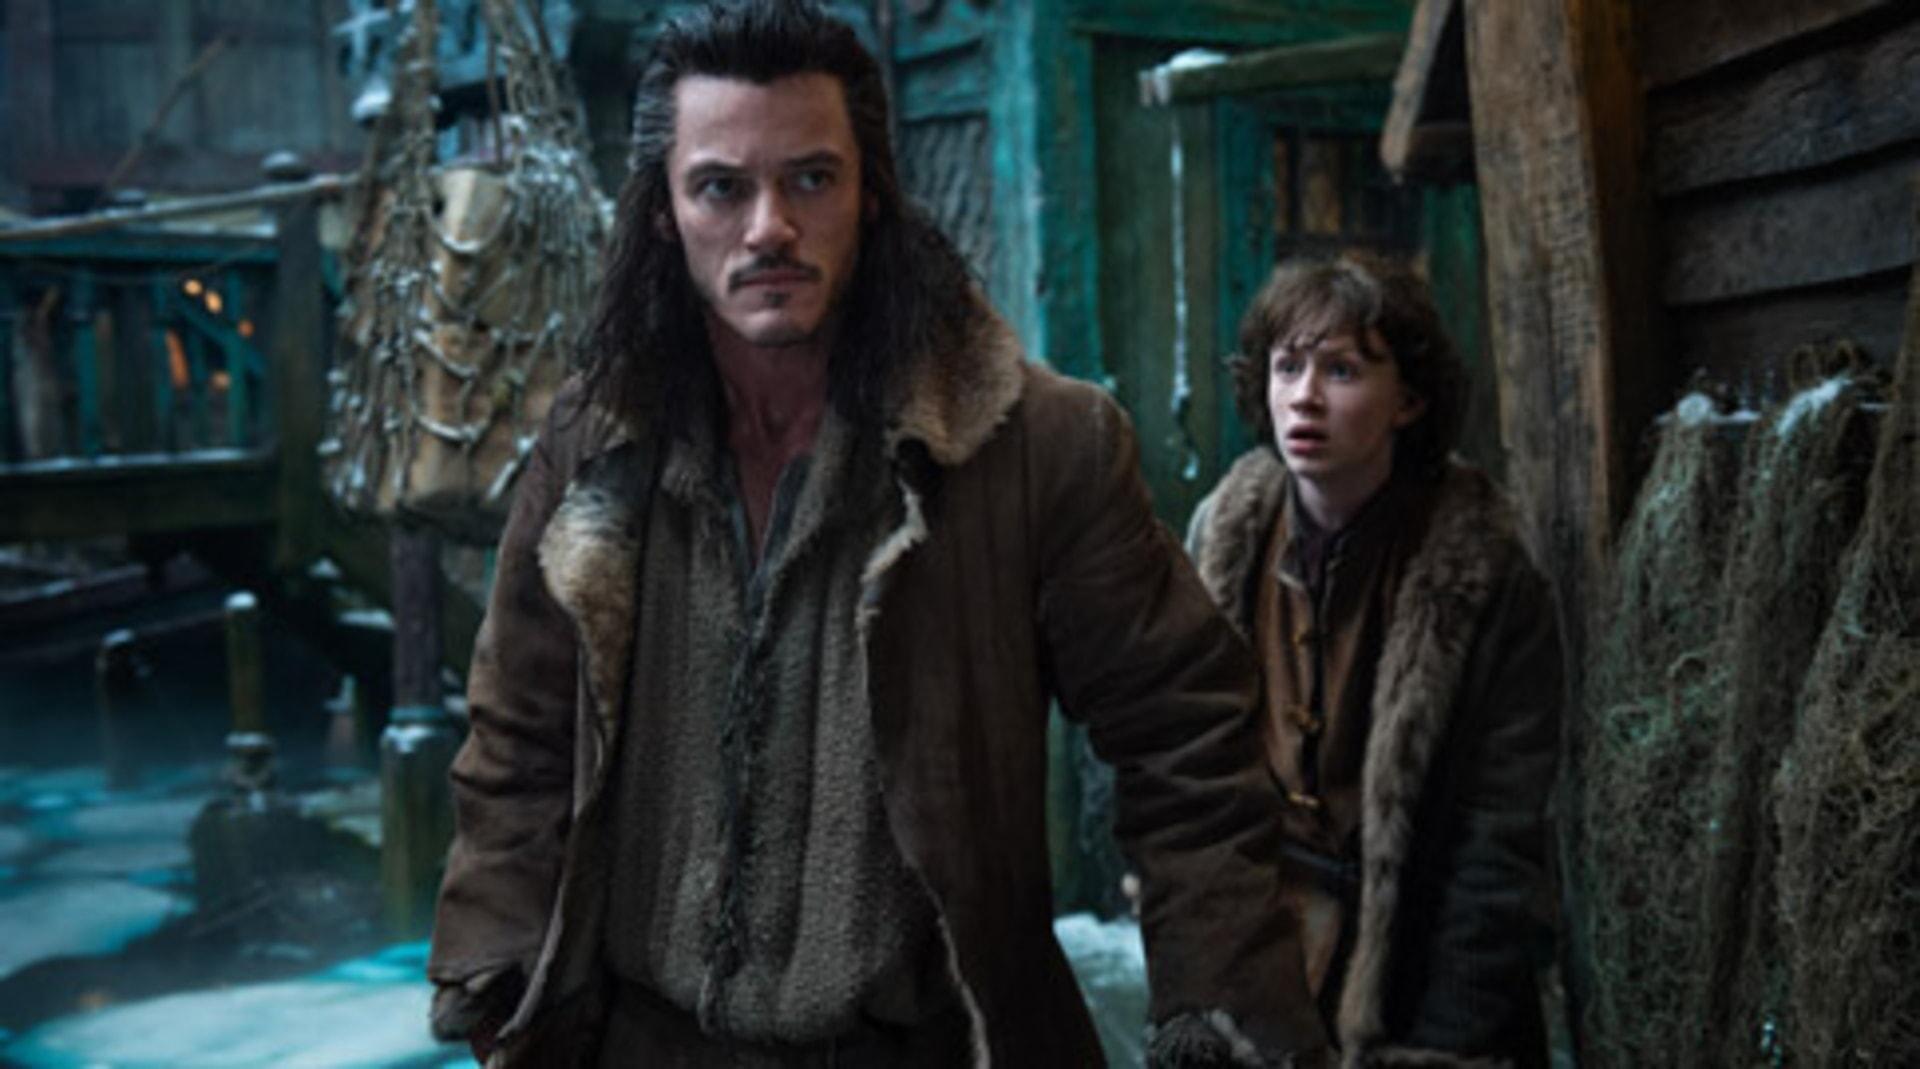 The Hobbit: The Desolation of Smaug - Image 39